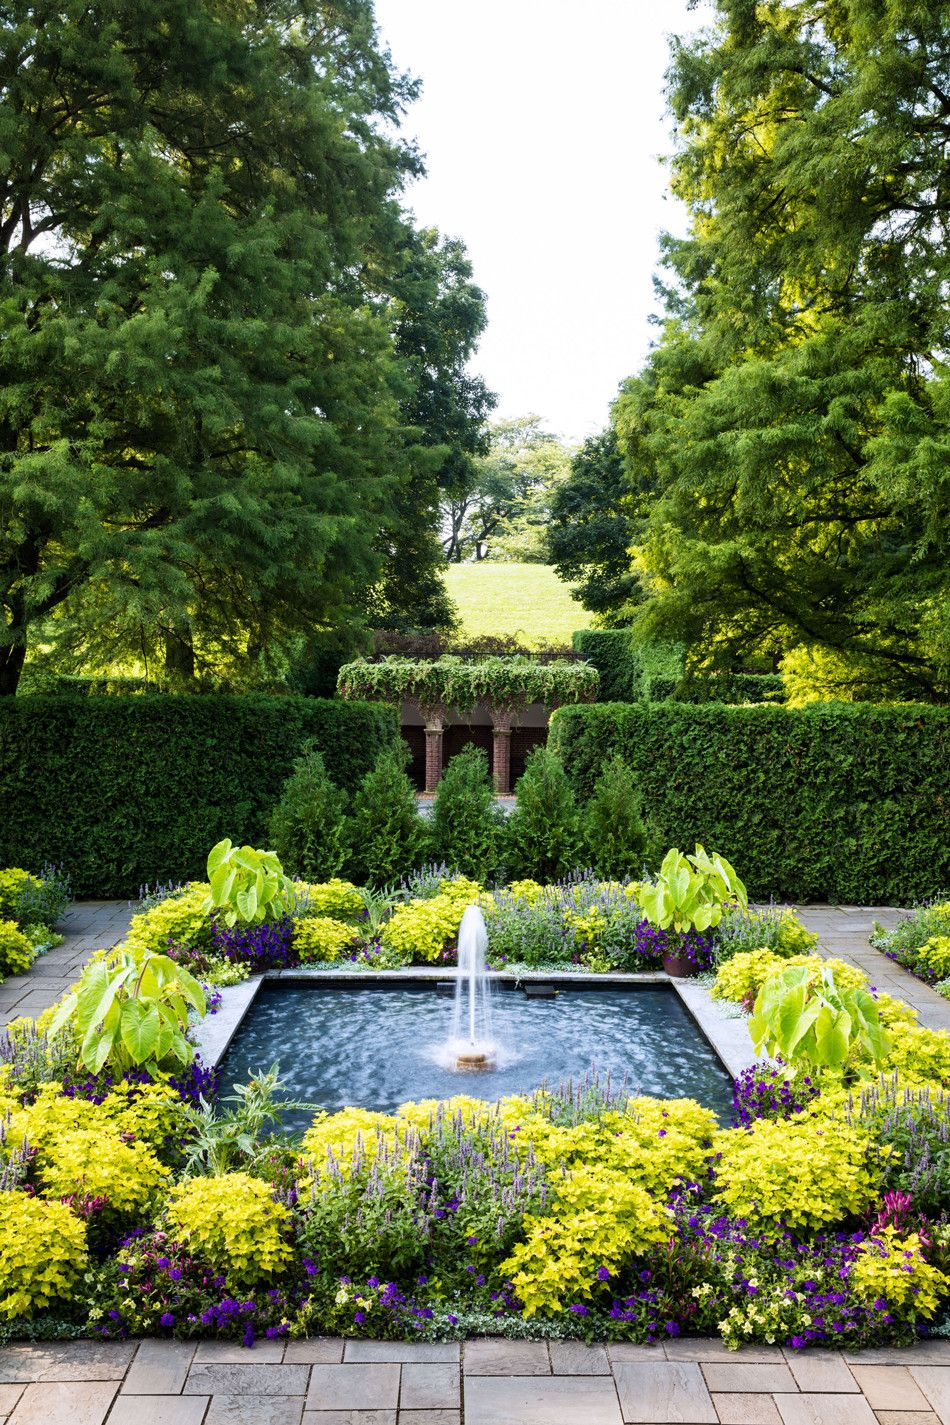 18bfa0de103ef895728962e05711f23b - Shrek The Halls Auburn Botanic Gardens